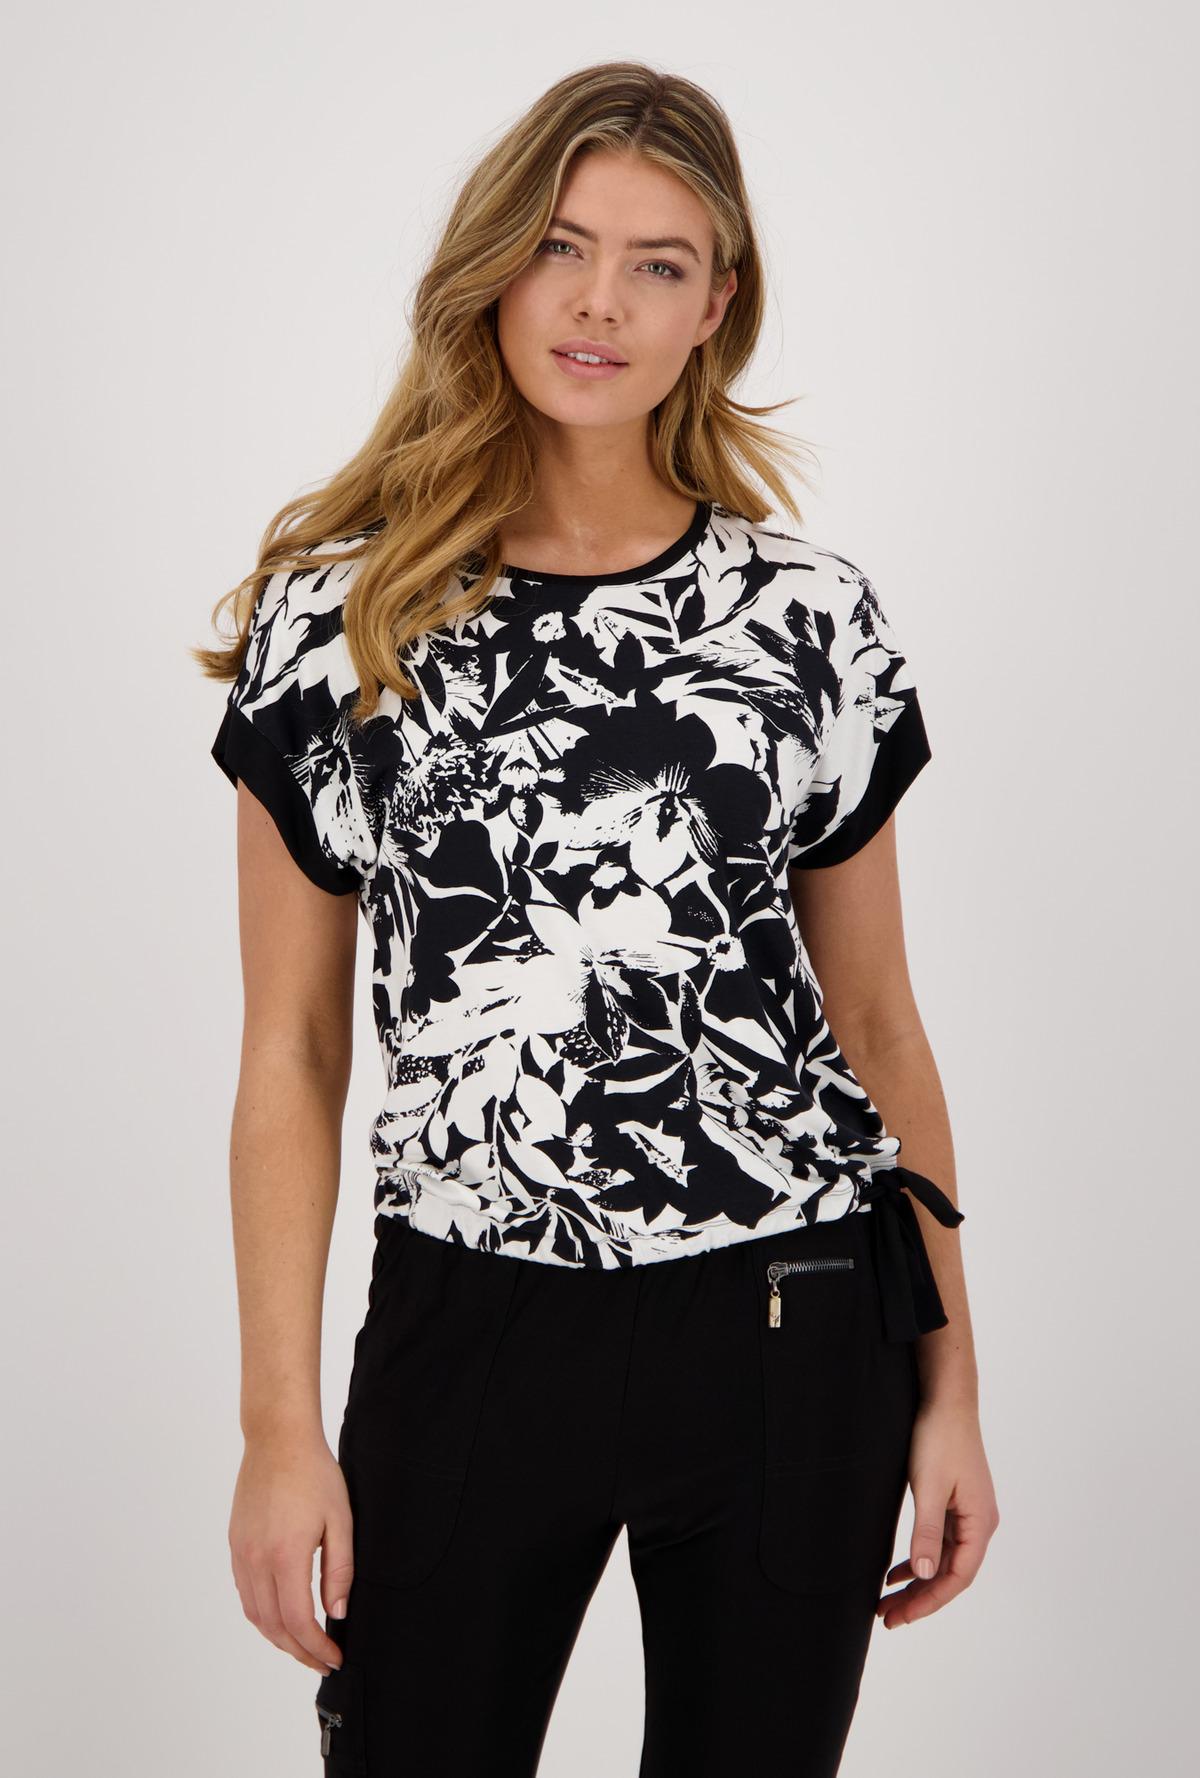 Monari Shirt Summer Time Flower Black and White